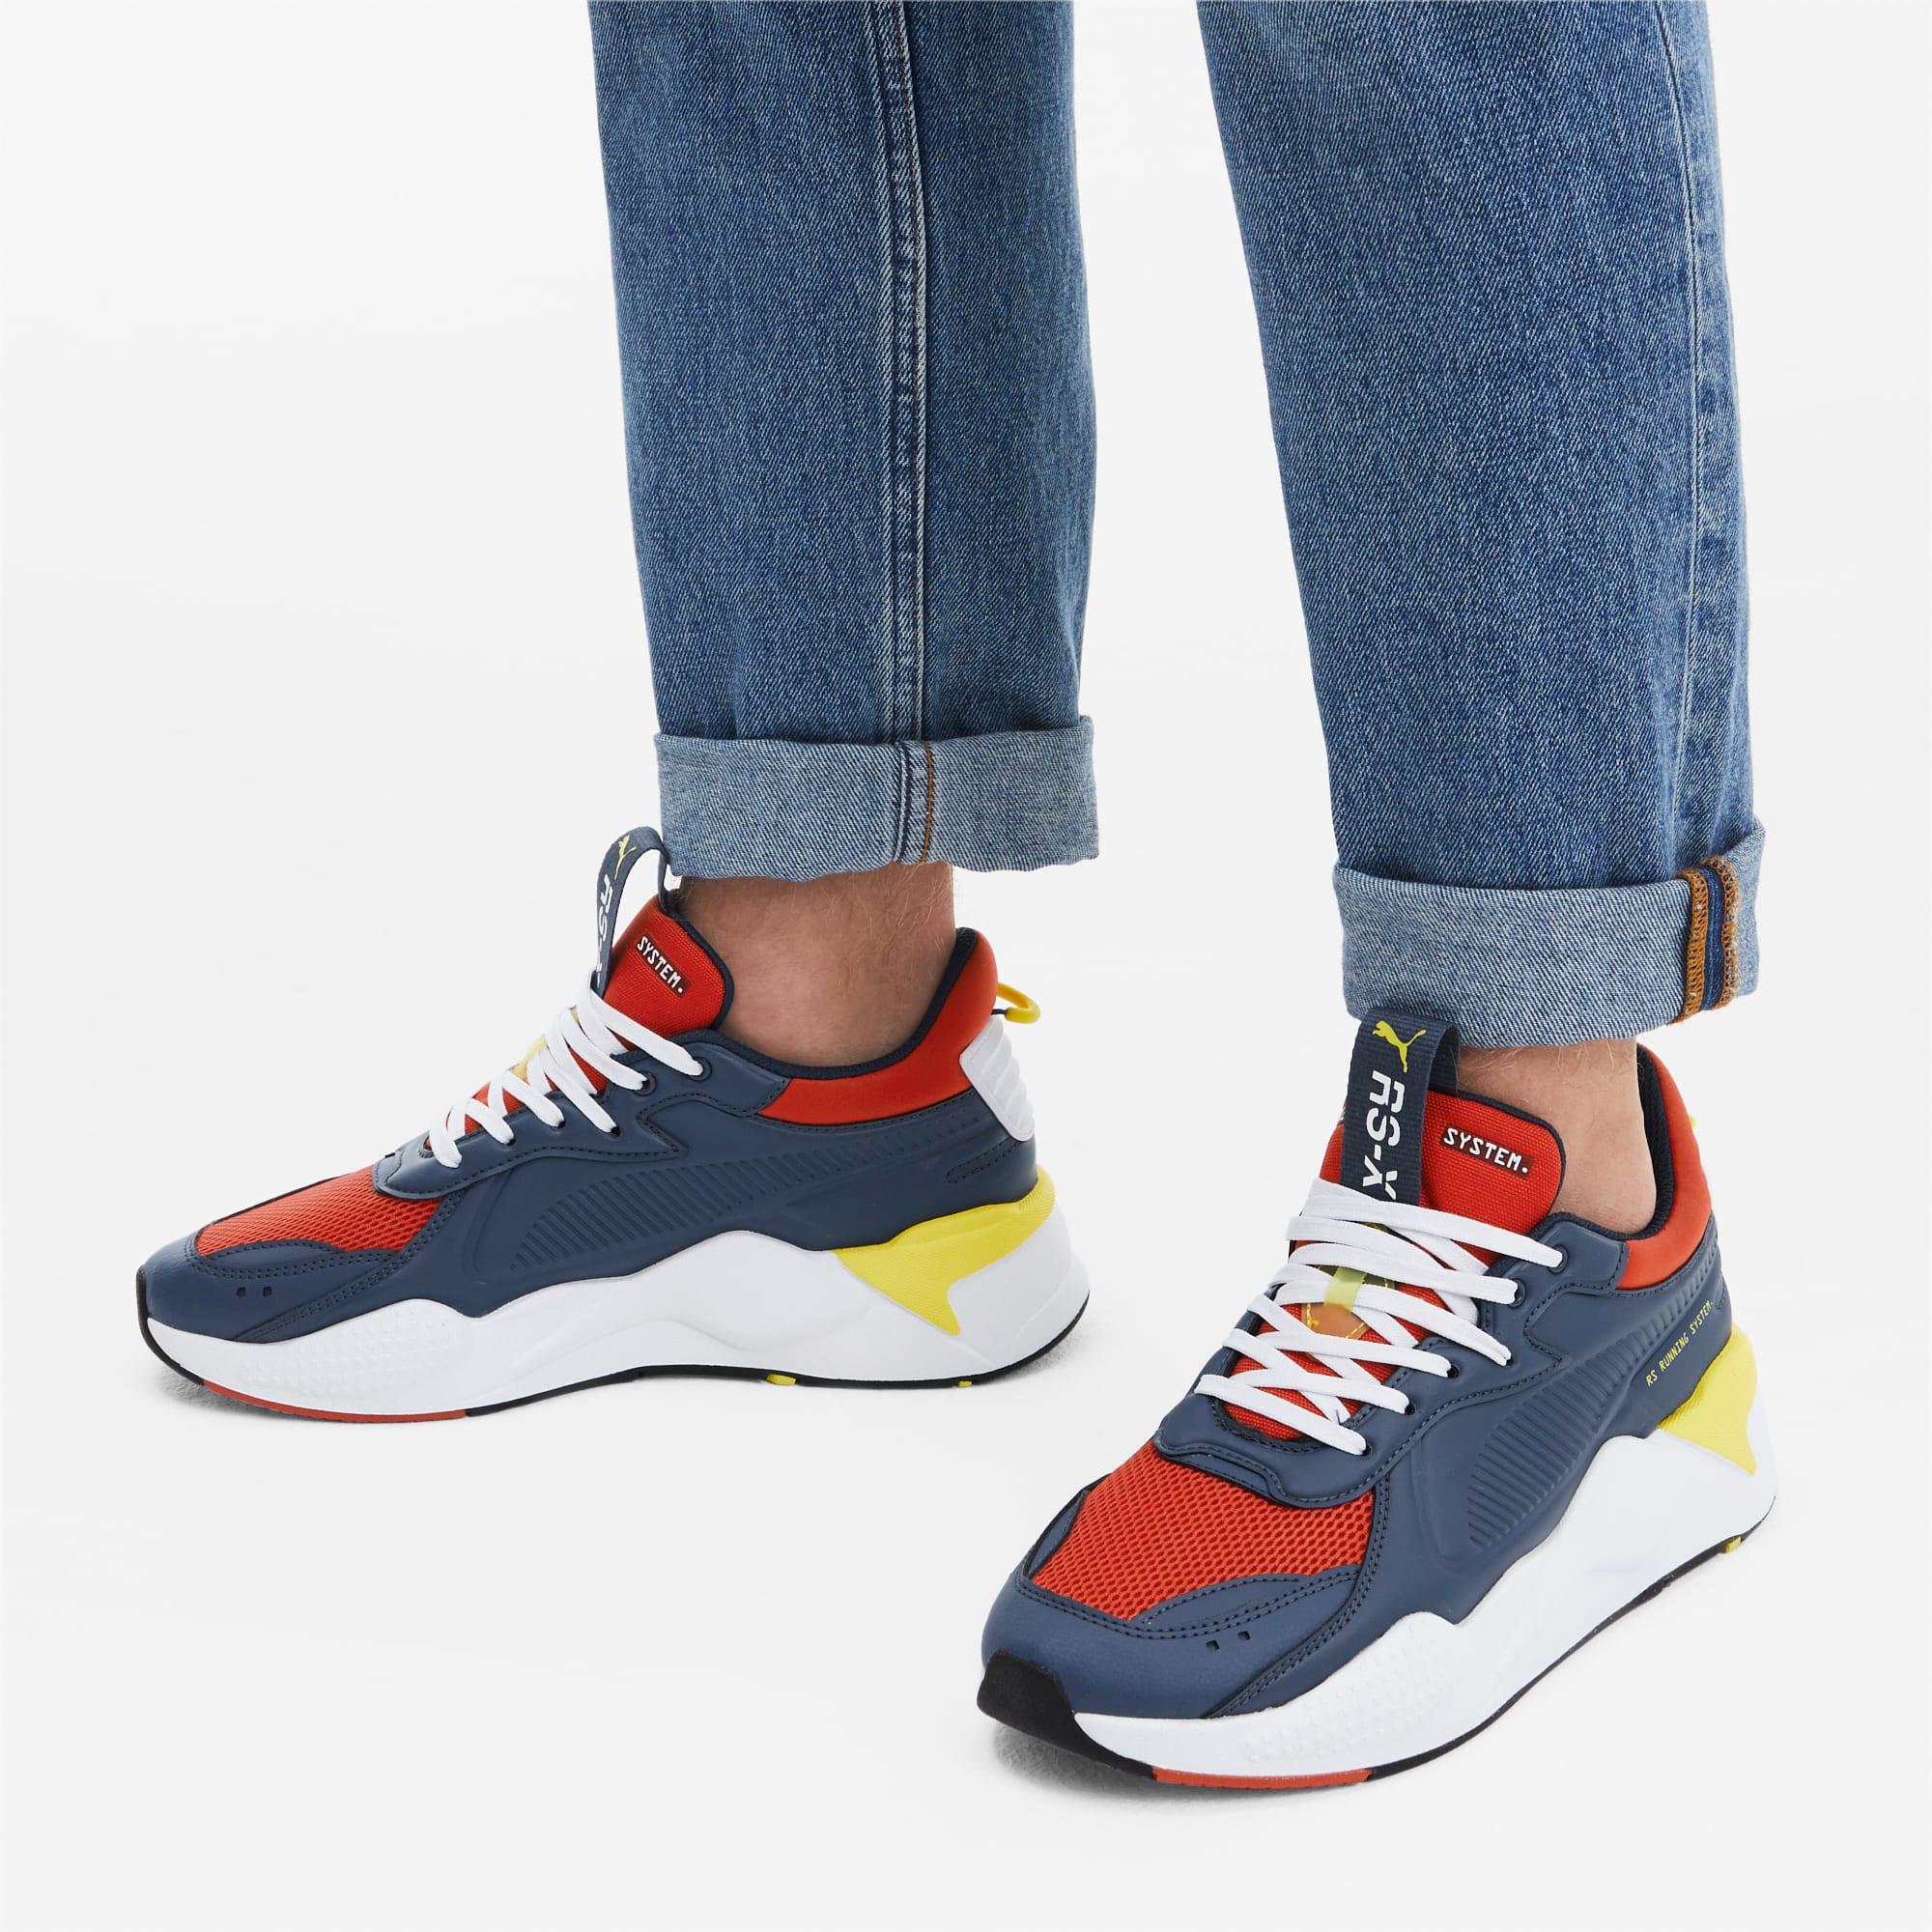 RS-X Master Men's Sneakers